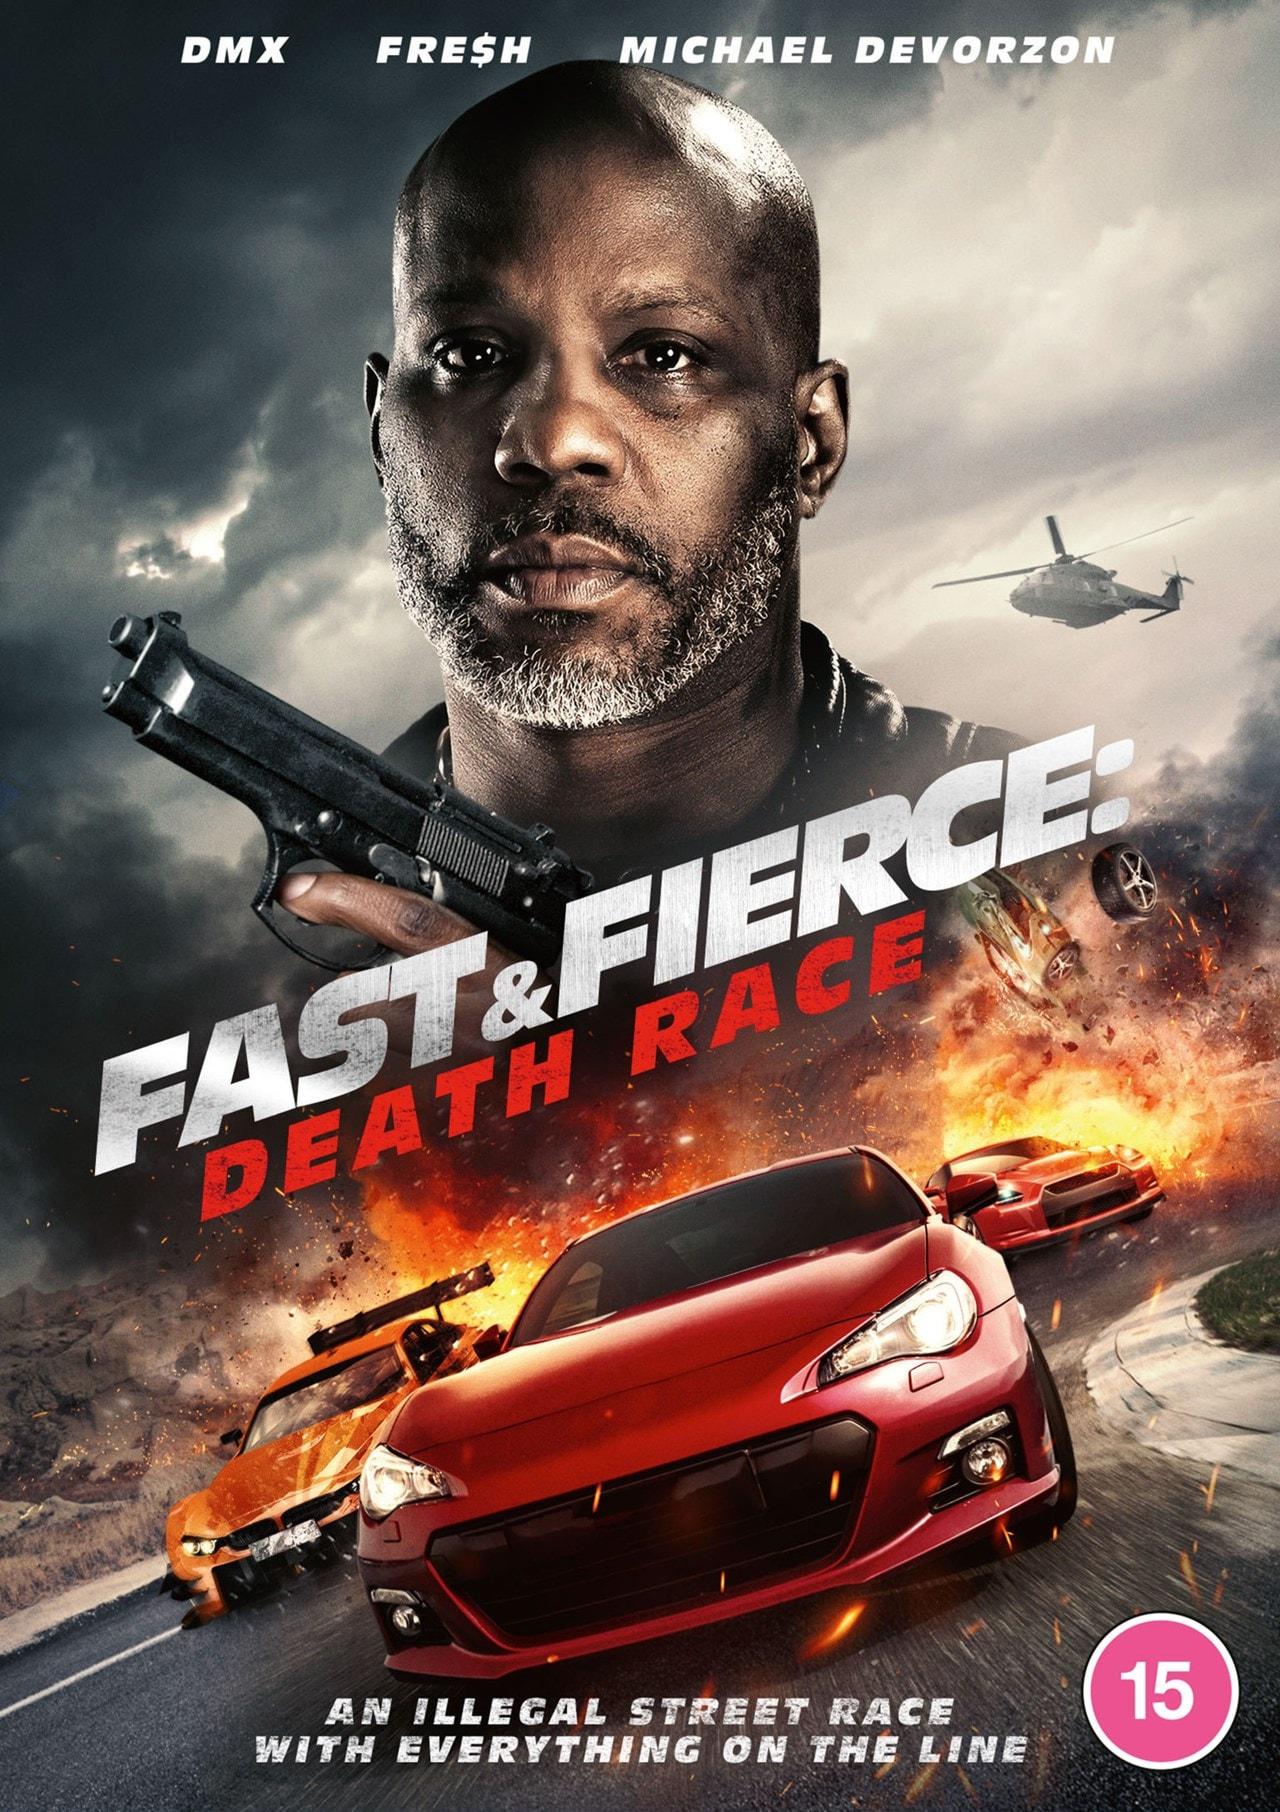 دانلود فیلم اکشن Fast and Fierce: Death Race 2020 سریع و خشن: مسابقه مرگ